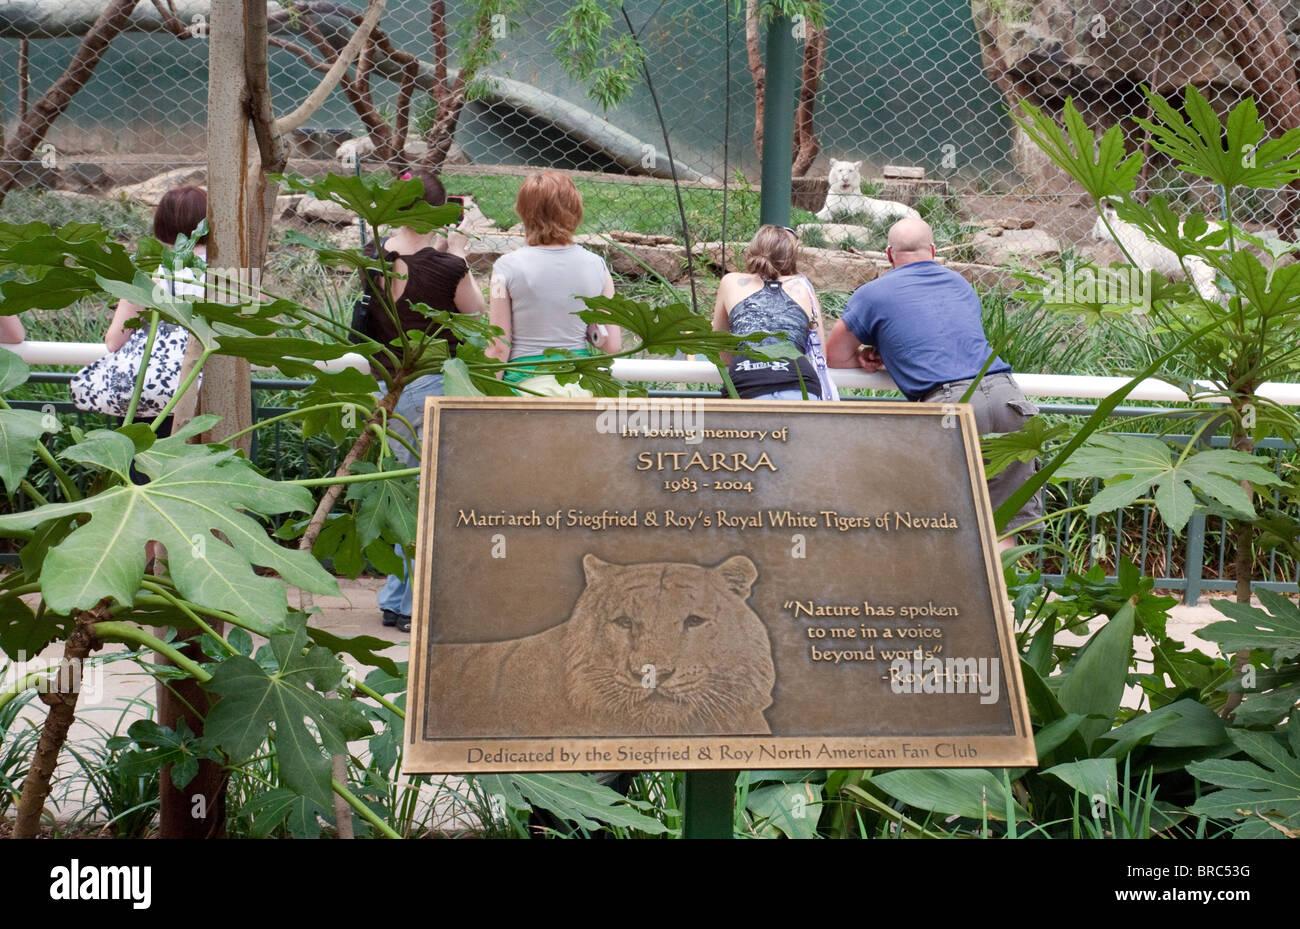 Memorial To Sitarra White Tiger Siegfried Roy 39 S Secret Garden And Stock Photo Royalty Free